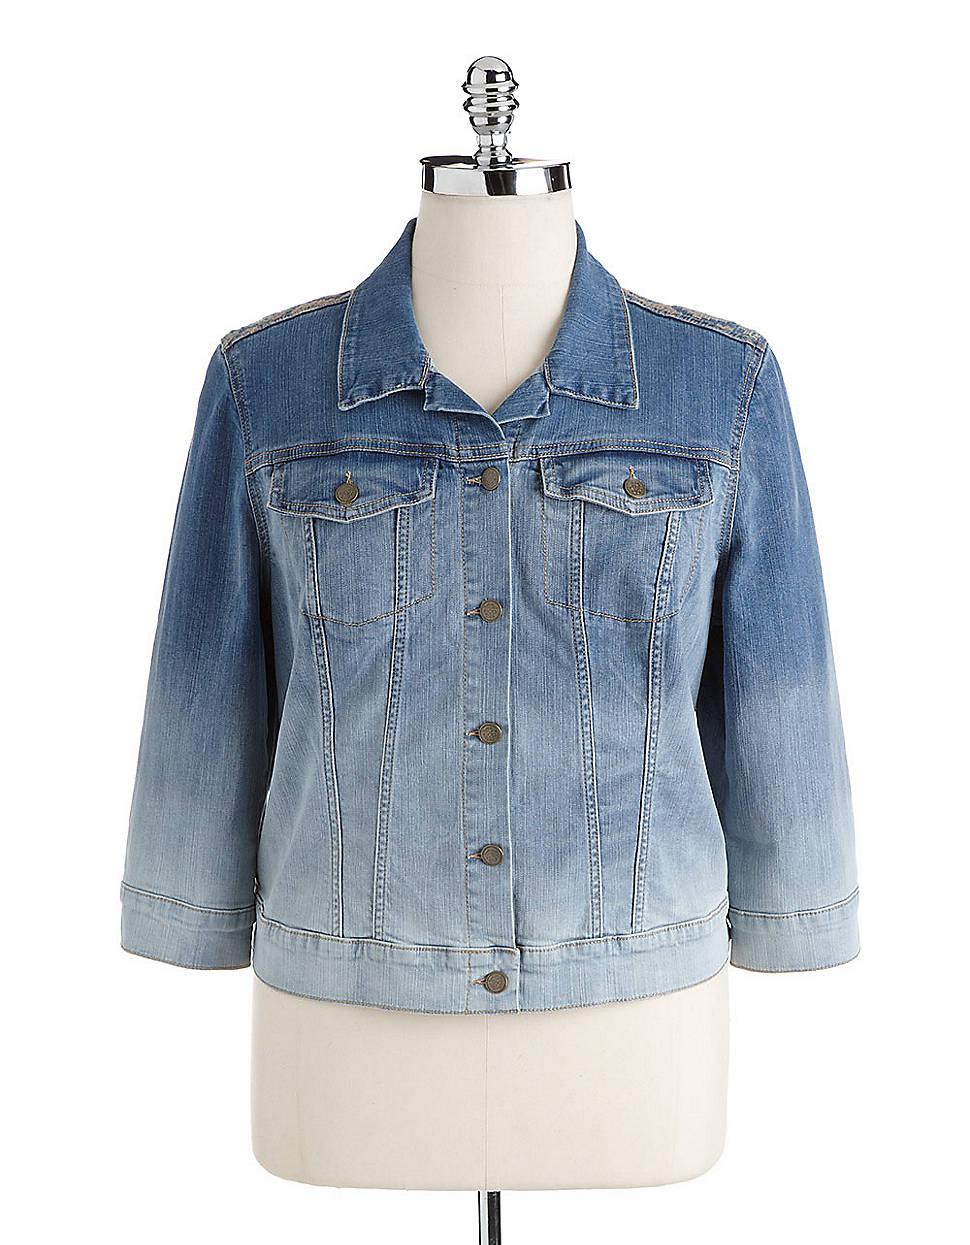 Jessica simpson plus miro embroidered denim jacket in blue